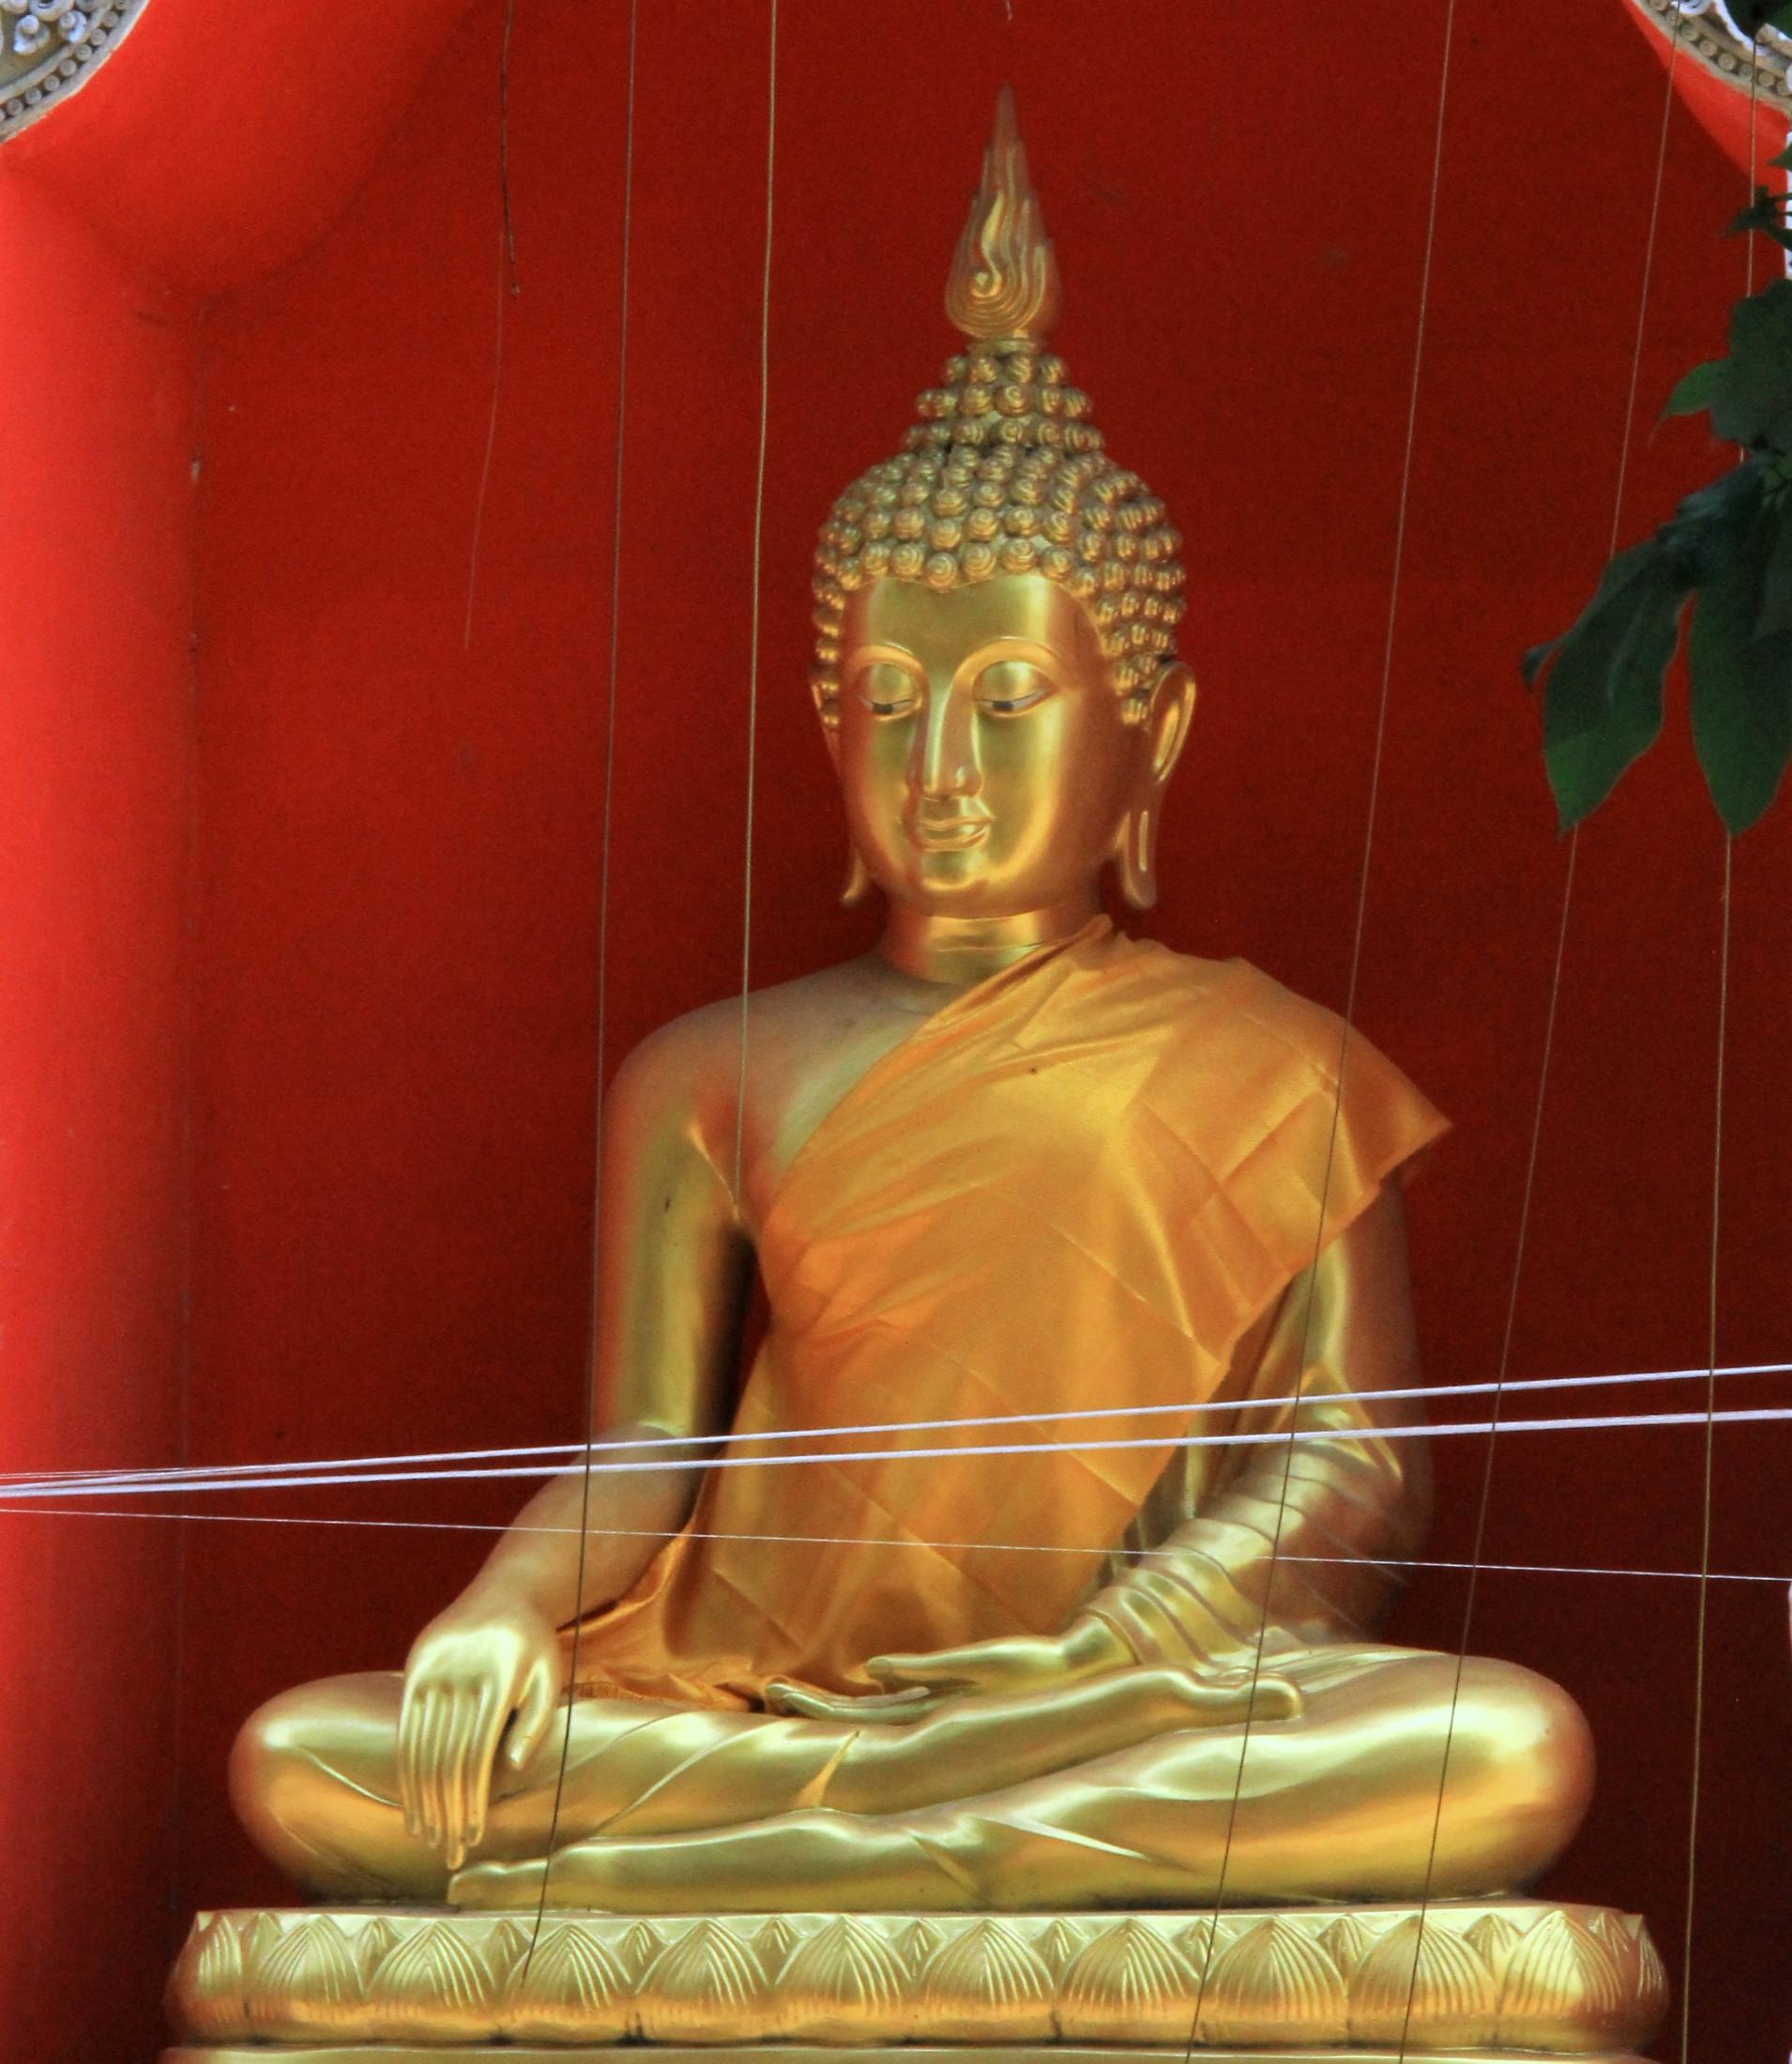 And peaceful spirituality